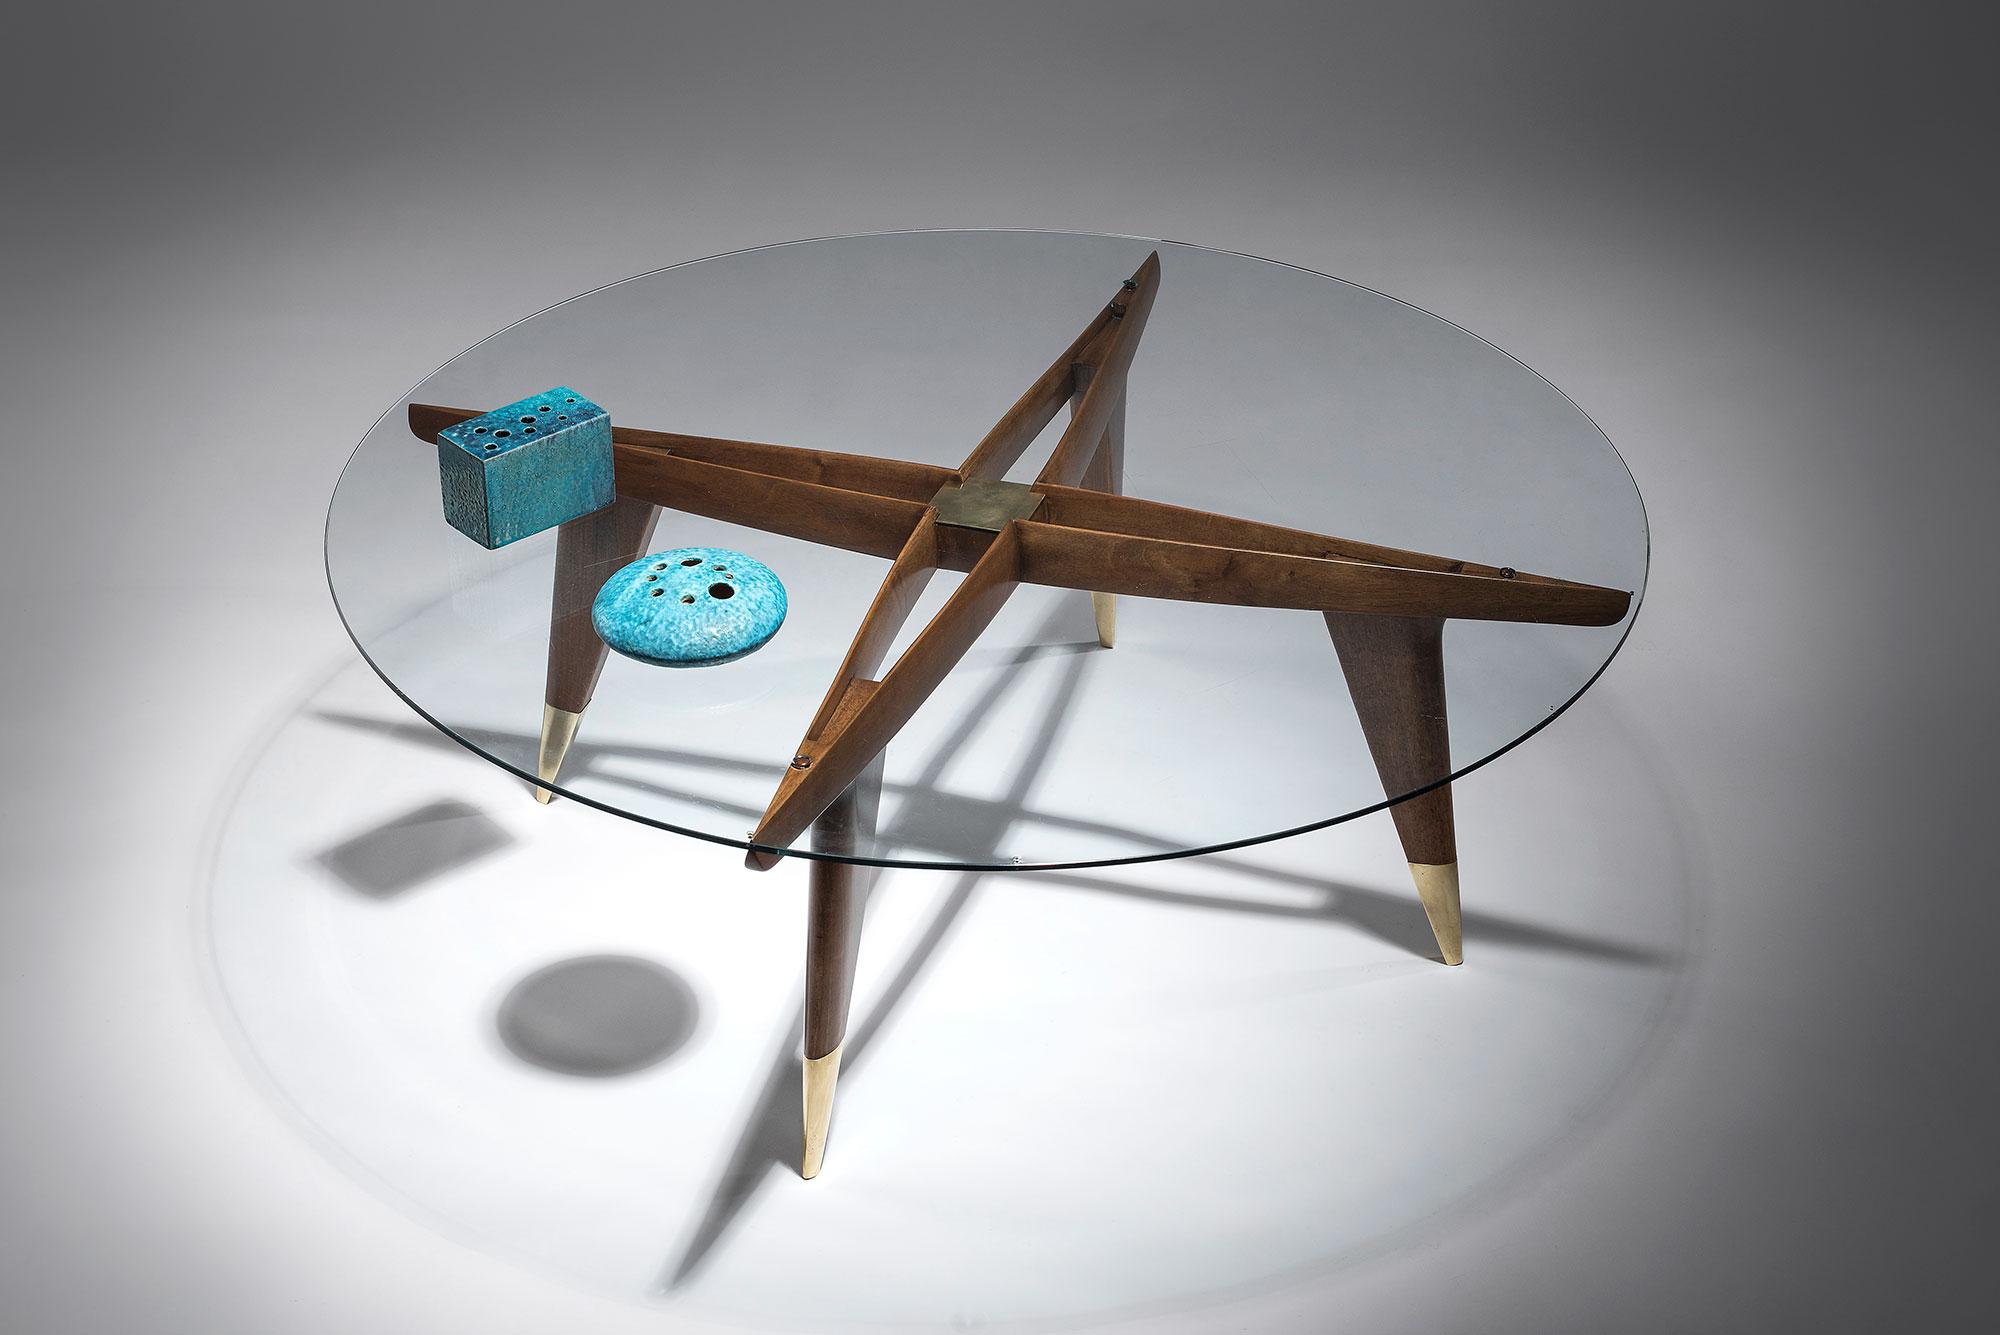 Gio Ponti Coffe table with ceramics